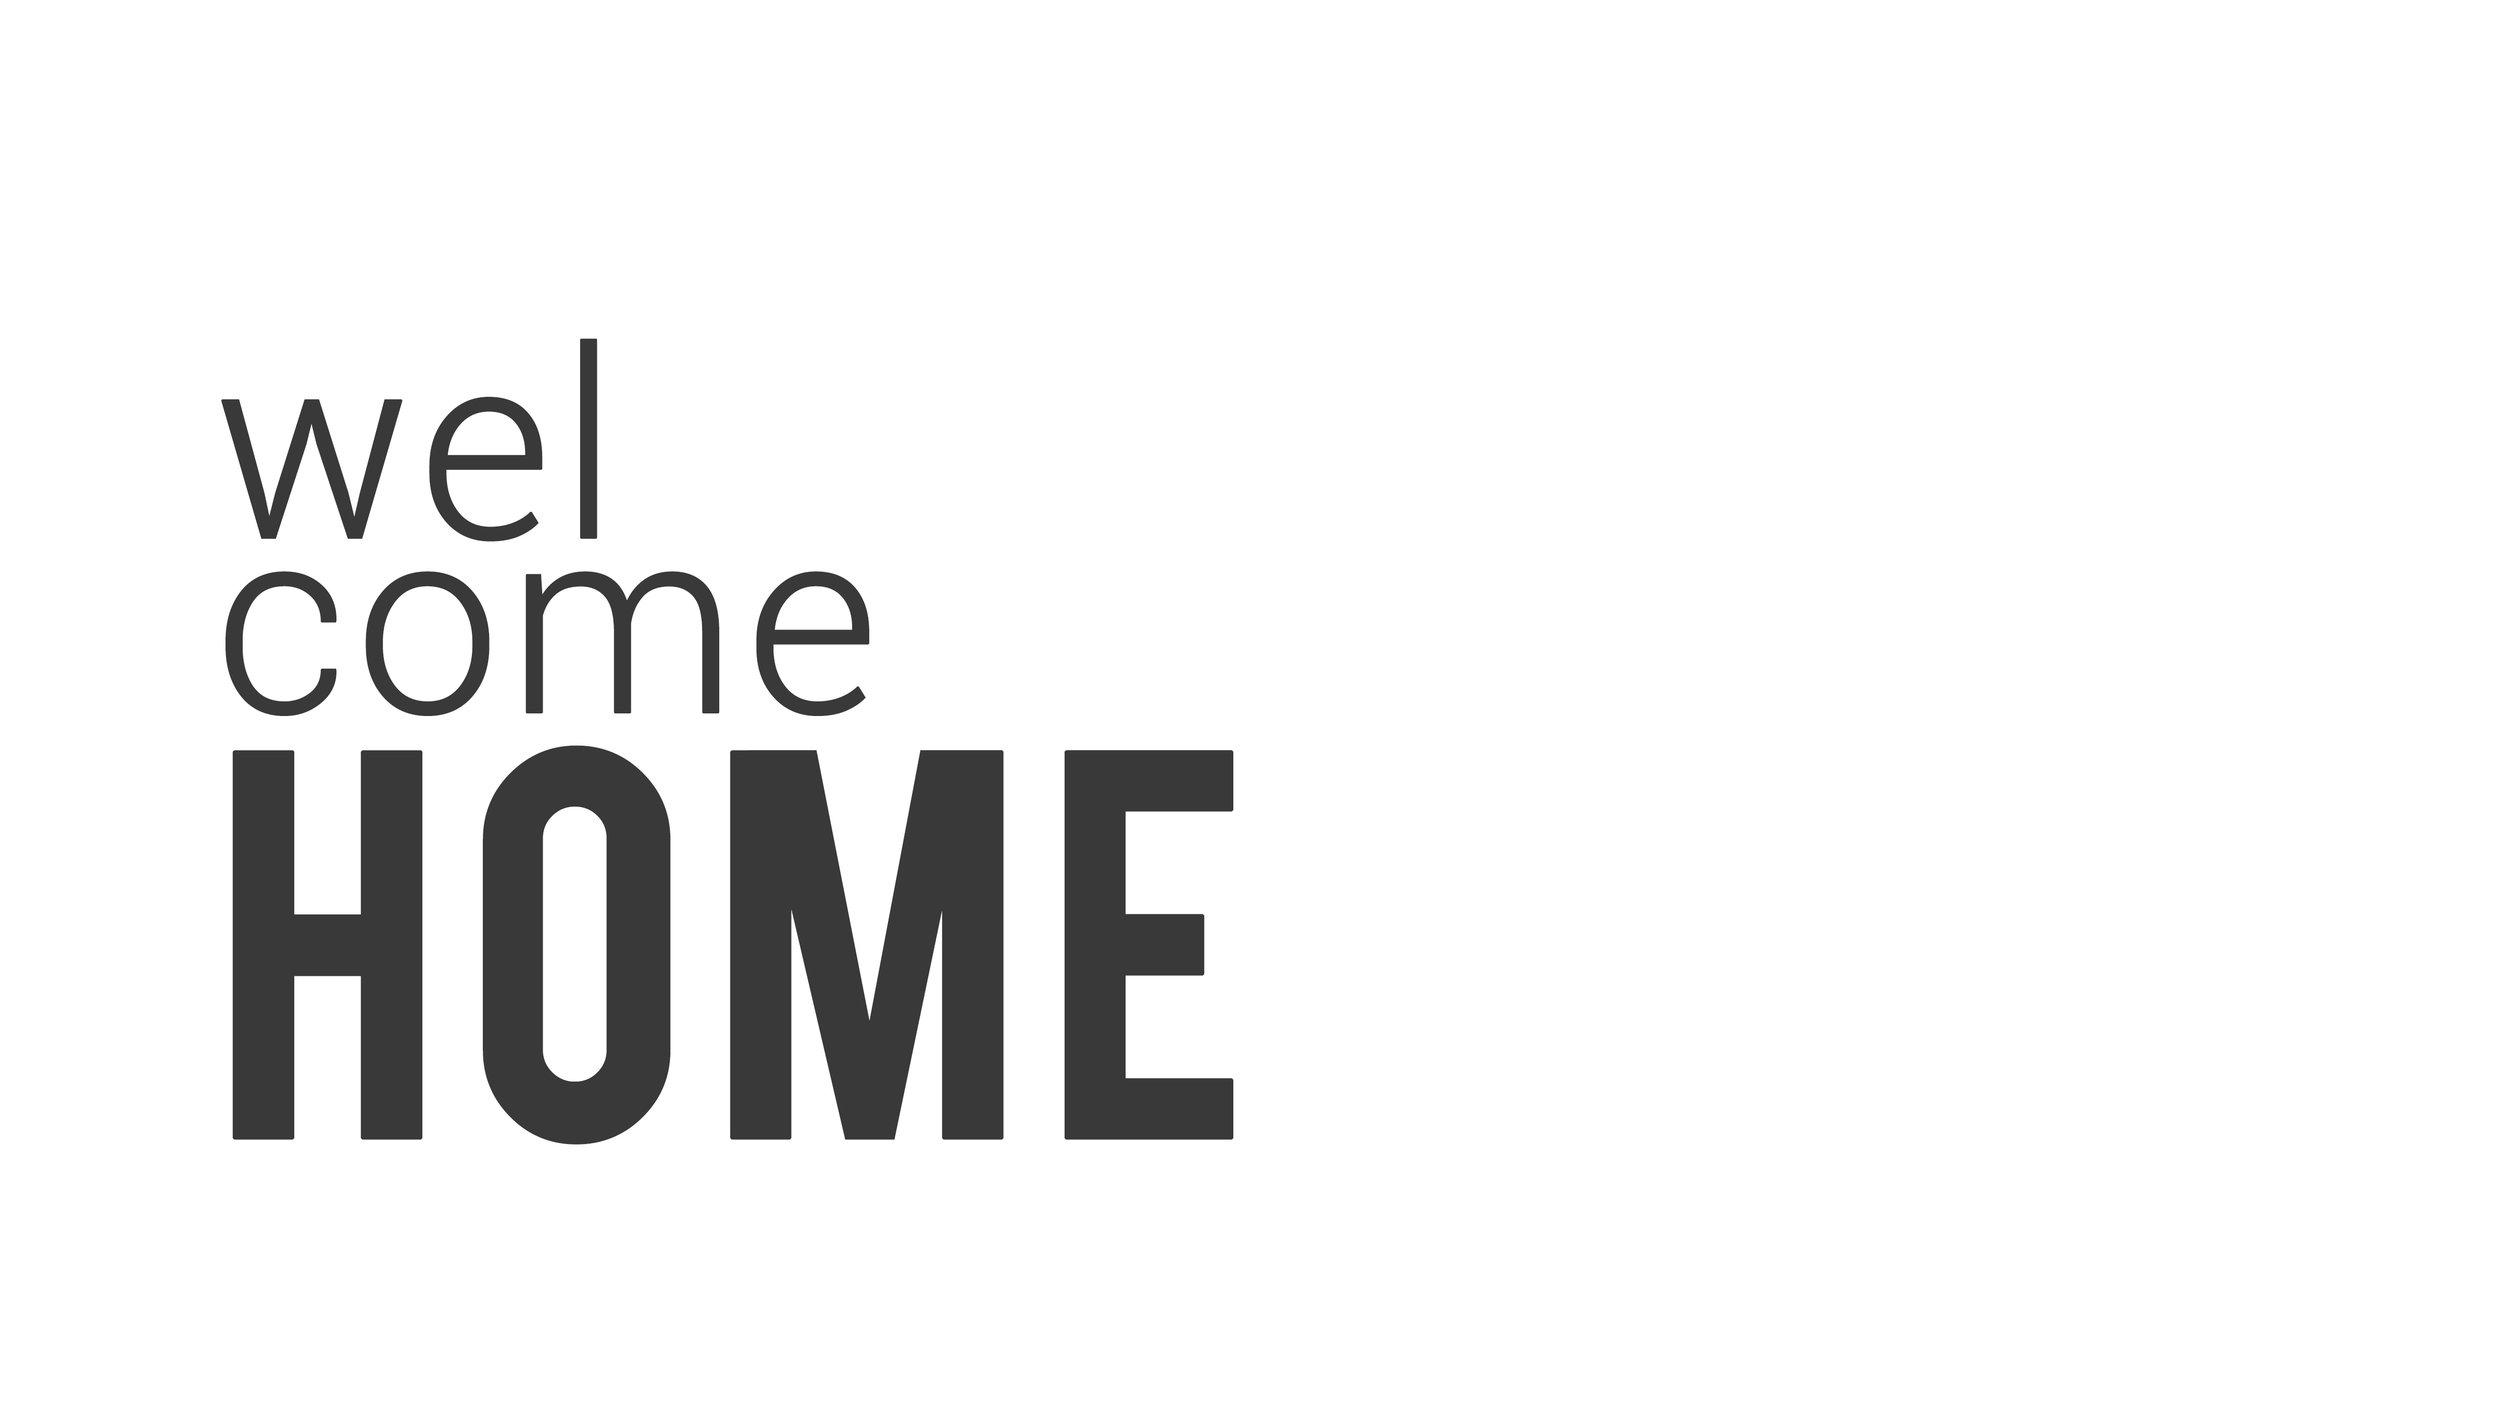 Welcome Home1.jpg